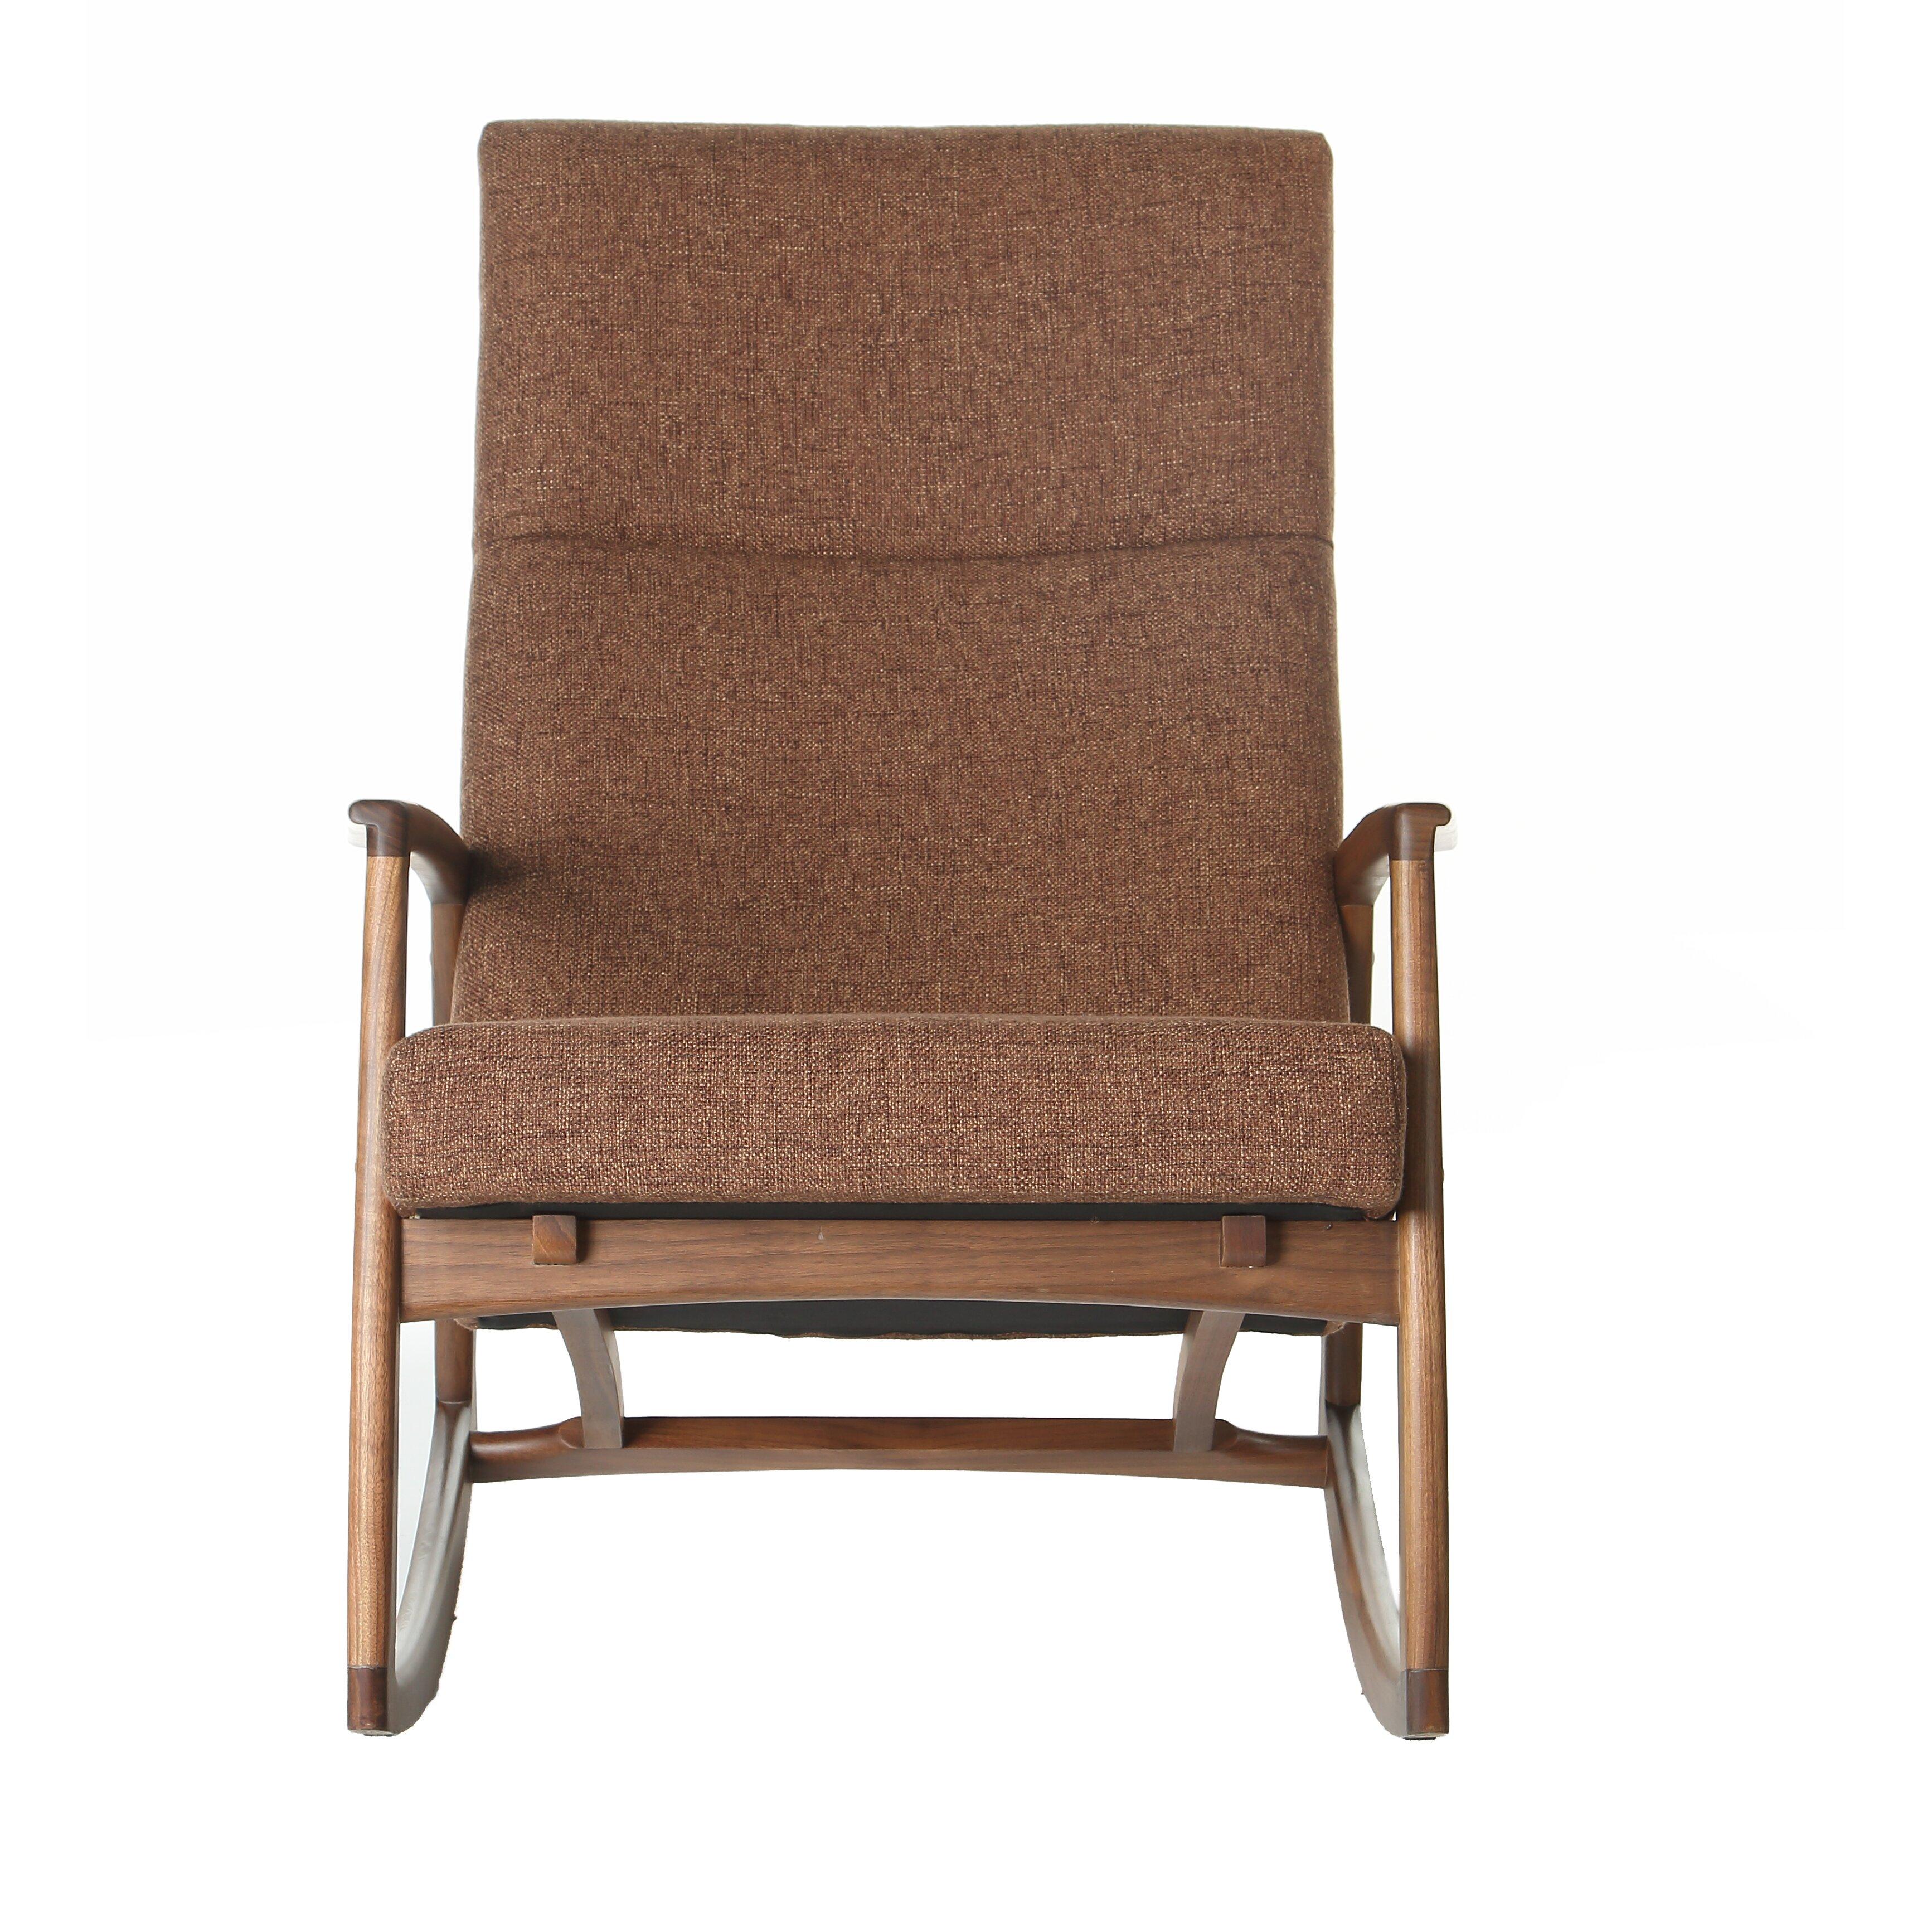 Design tree home hans wegner style rocking chair wayfair for Hans wegner queen chair